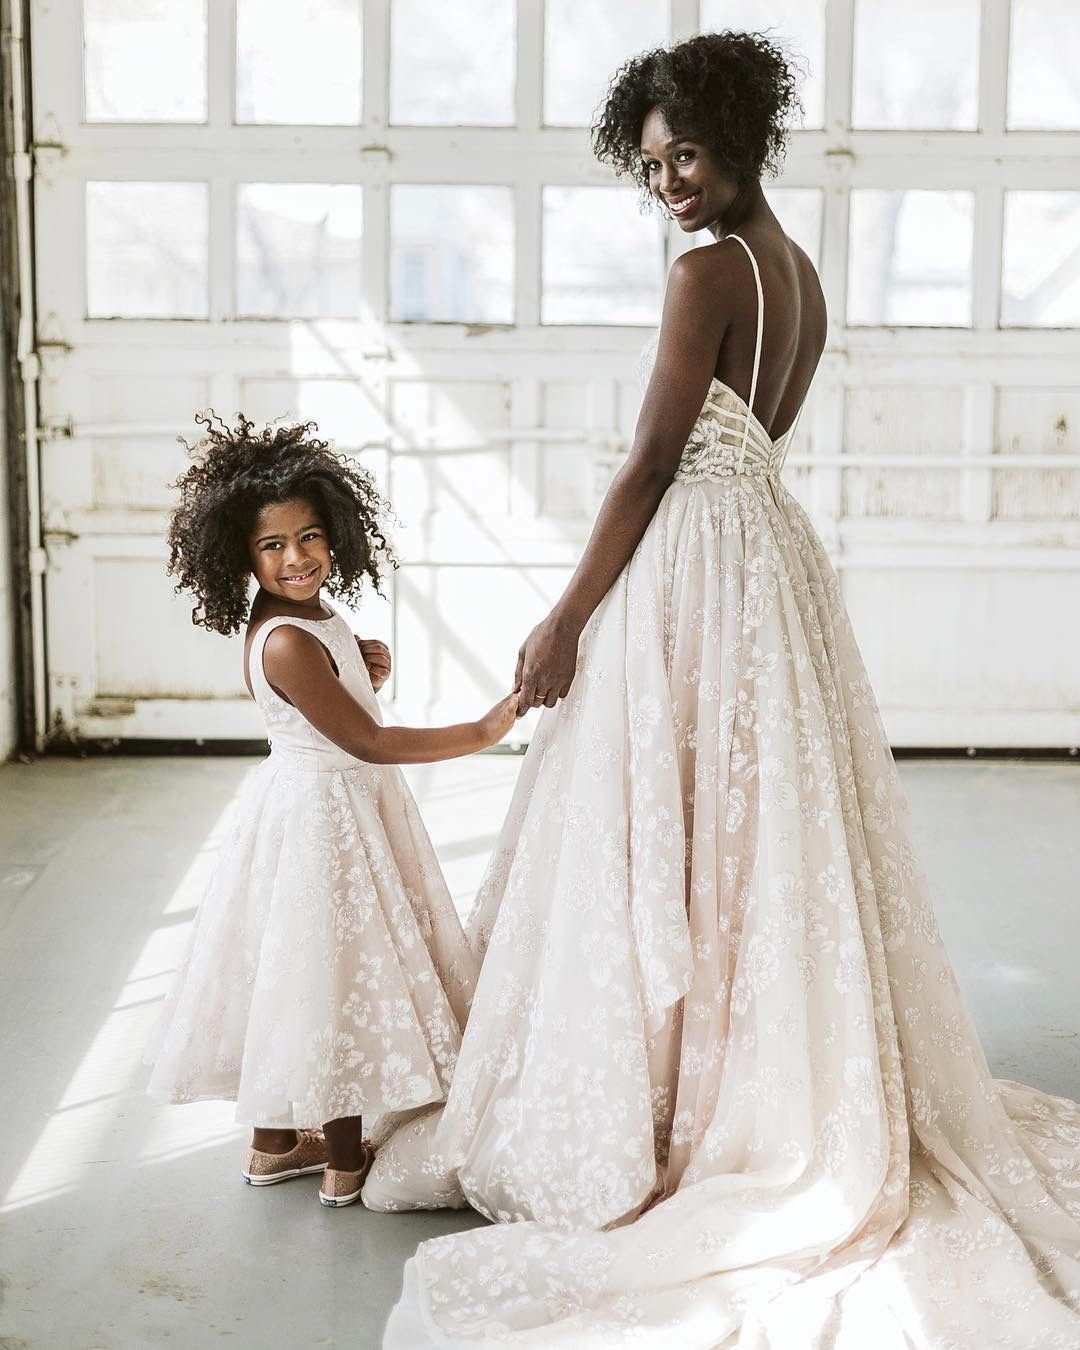 bd39ea992ea Matching wedding dress   flower girl dress by Hayley Paige